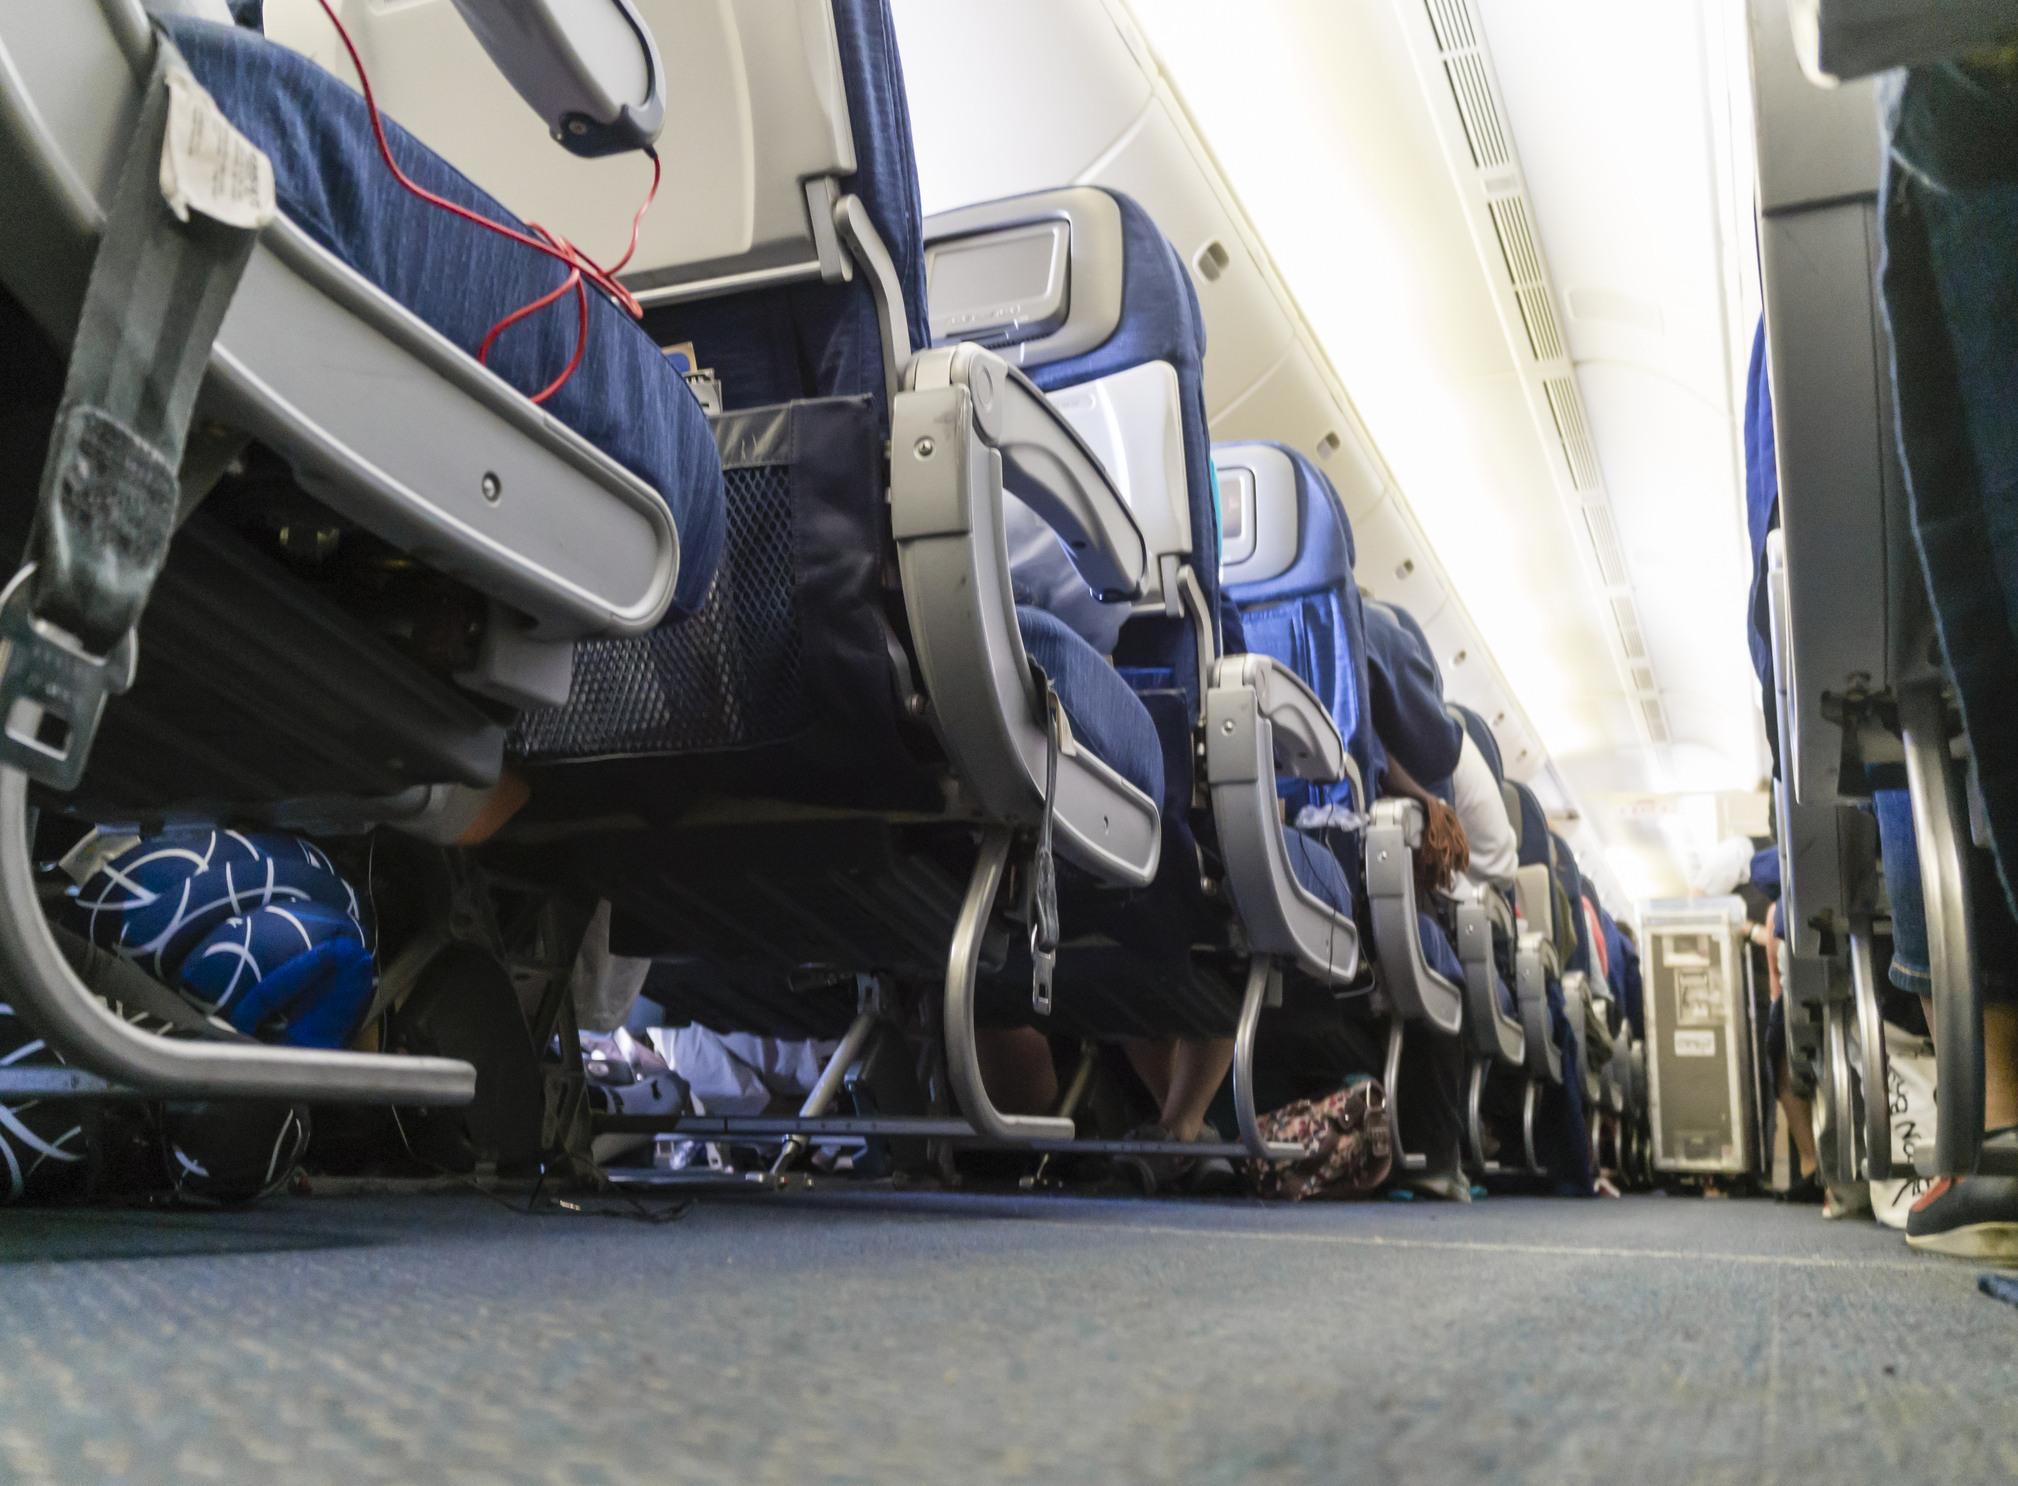 aisle of passenger airplane